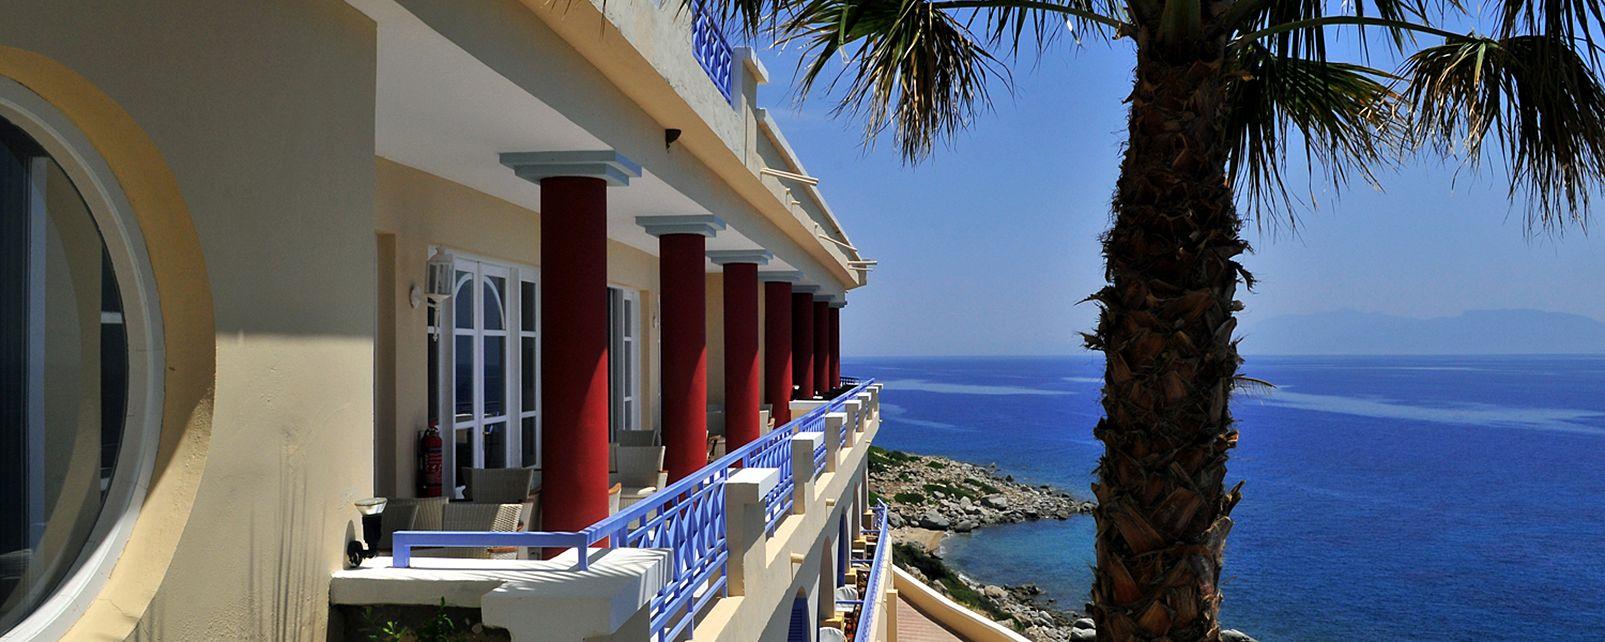 Hôtel Mitsis Summer Palace